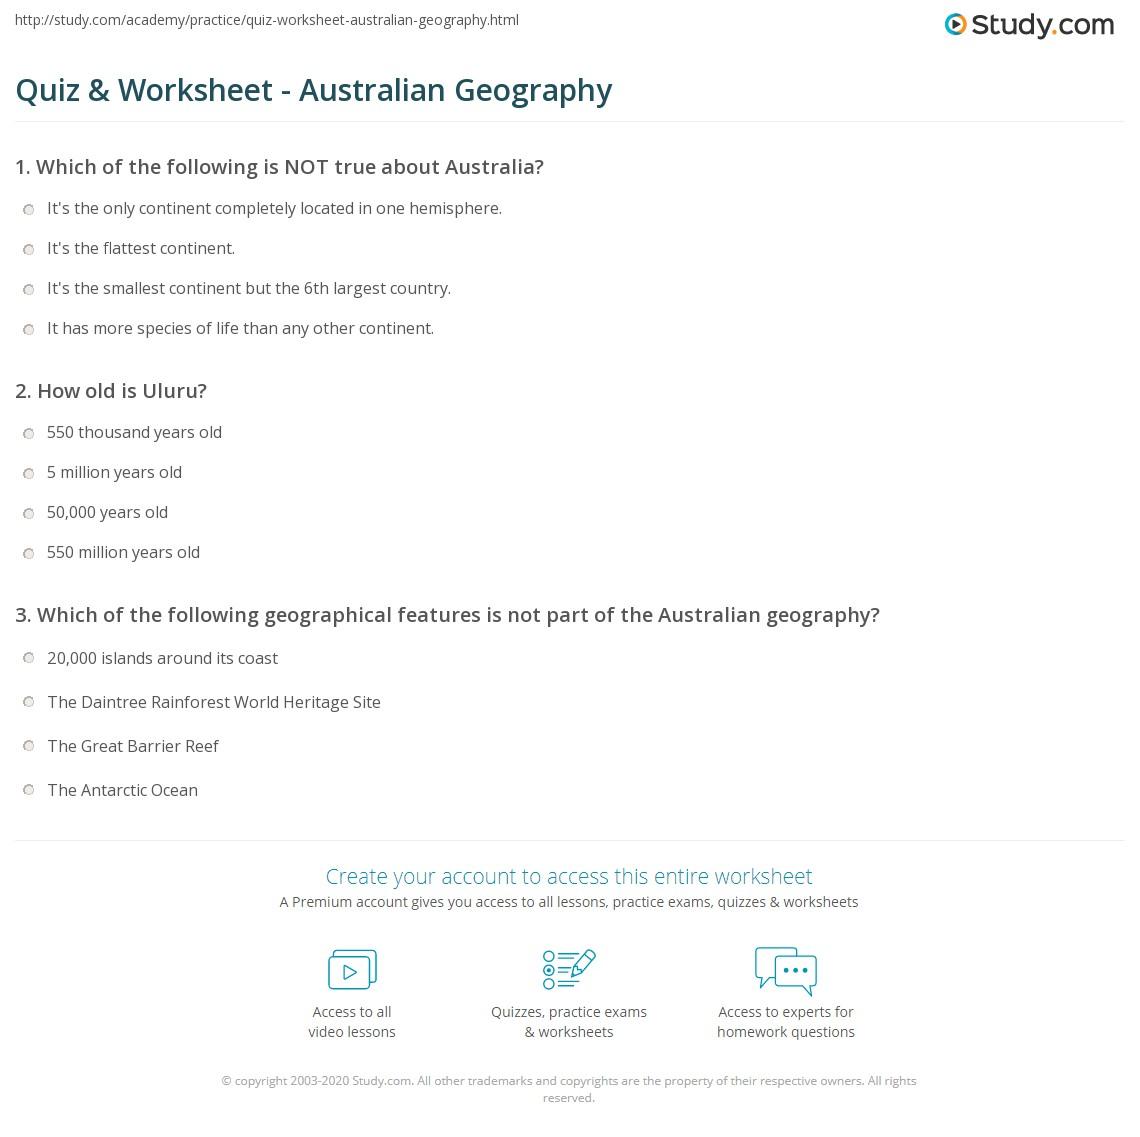 Quiz & Worksheet - Australian Geography | Study.com